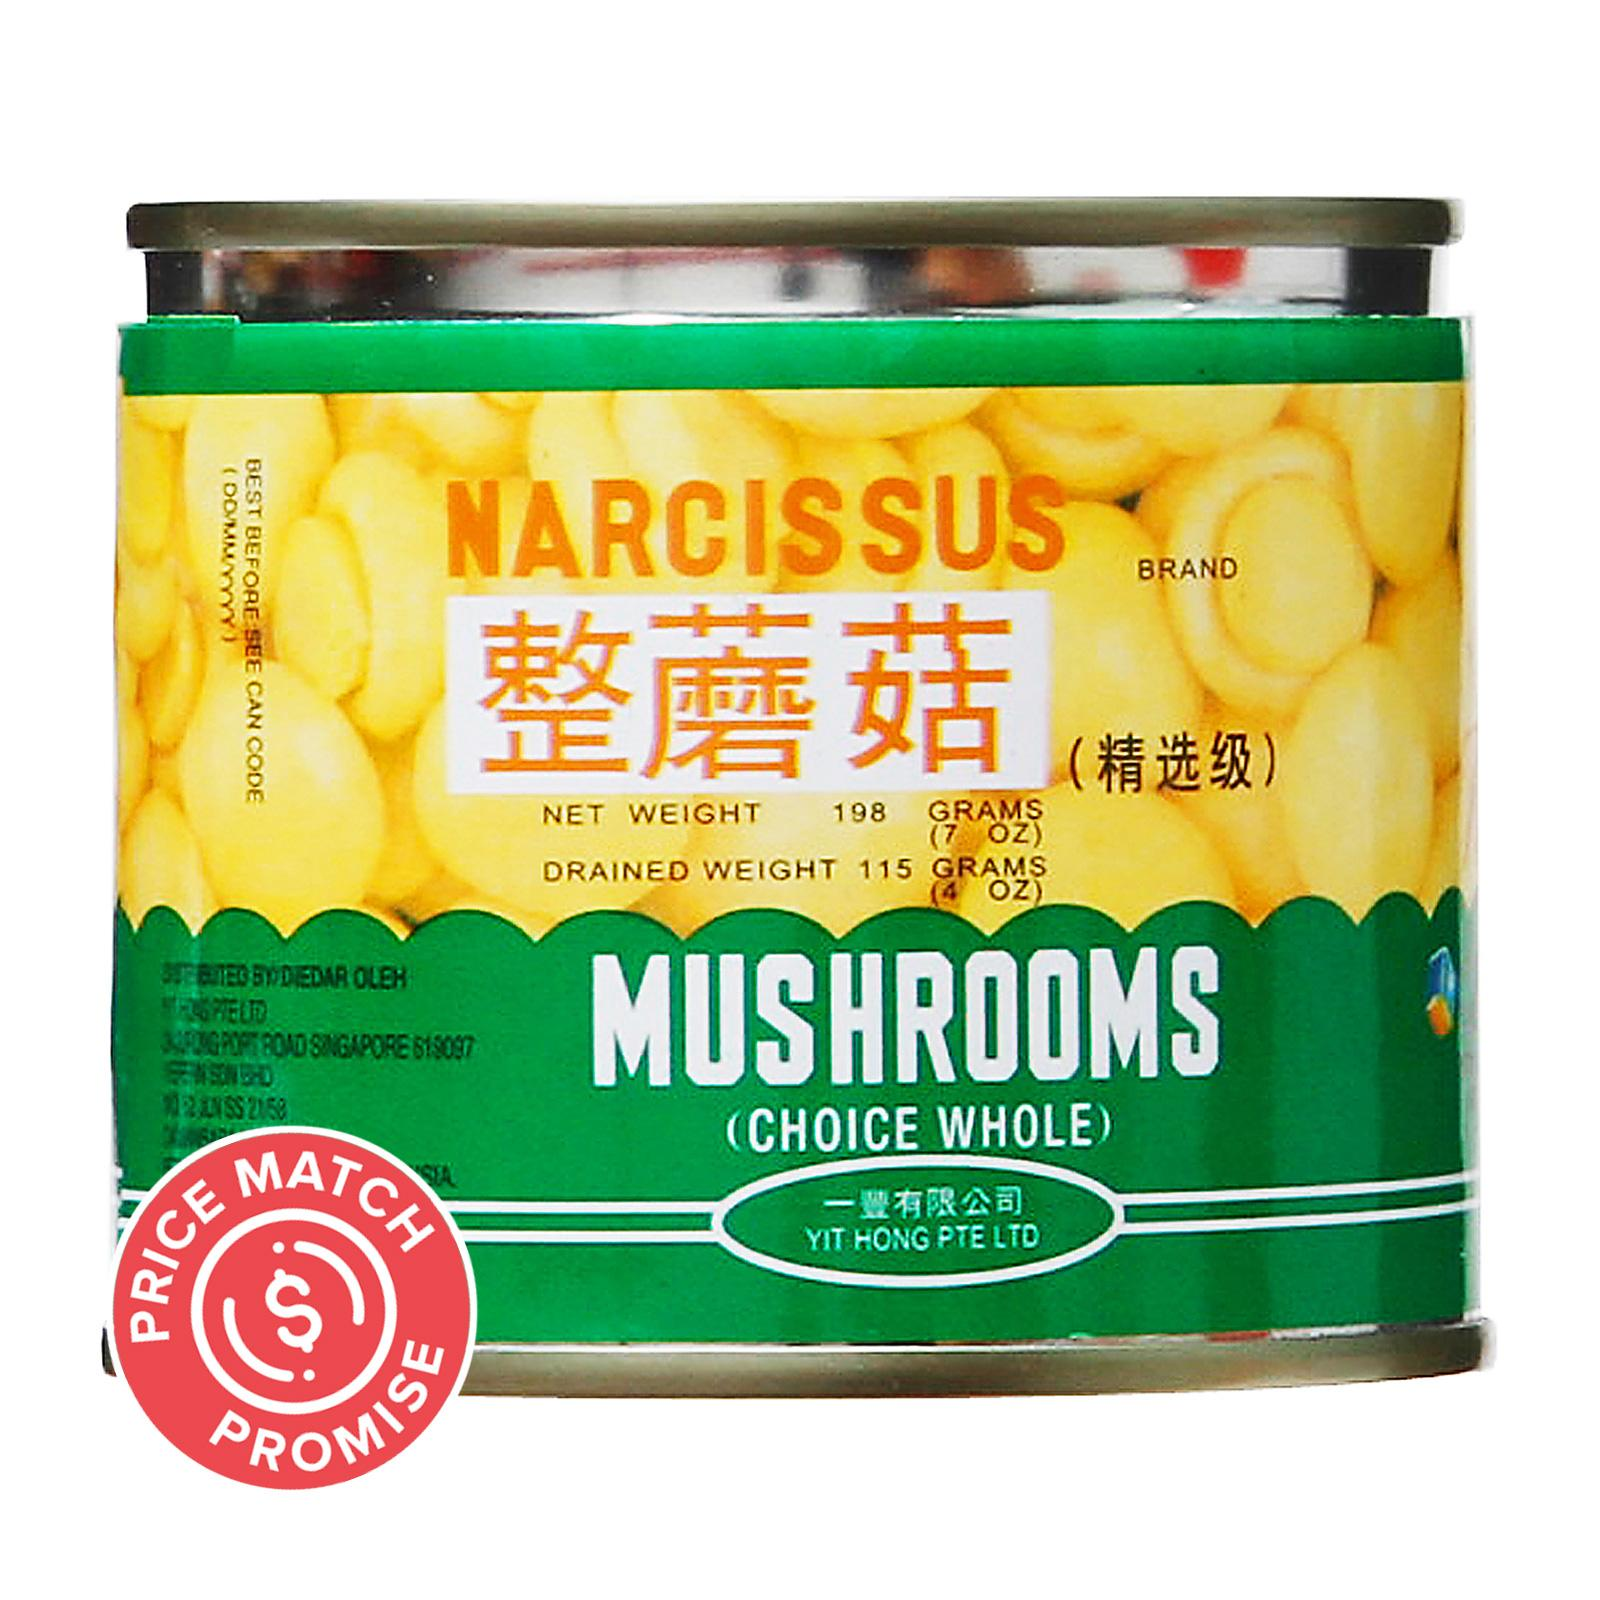 NARCISSUS Whole Mushrooms 198g